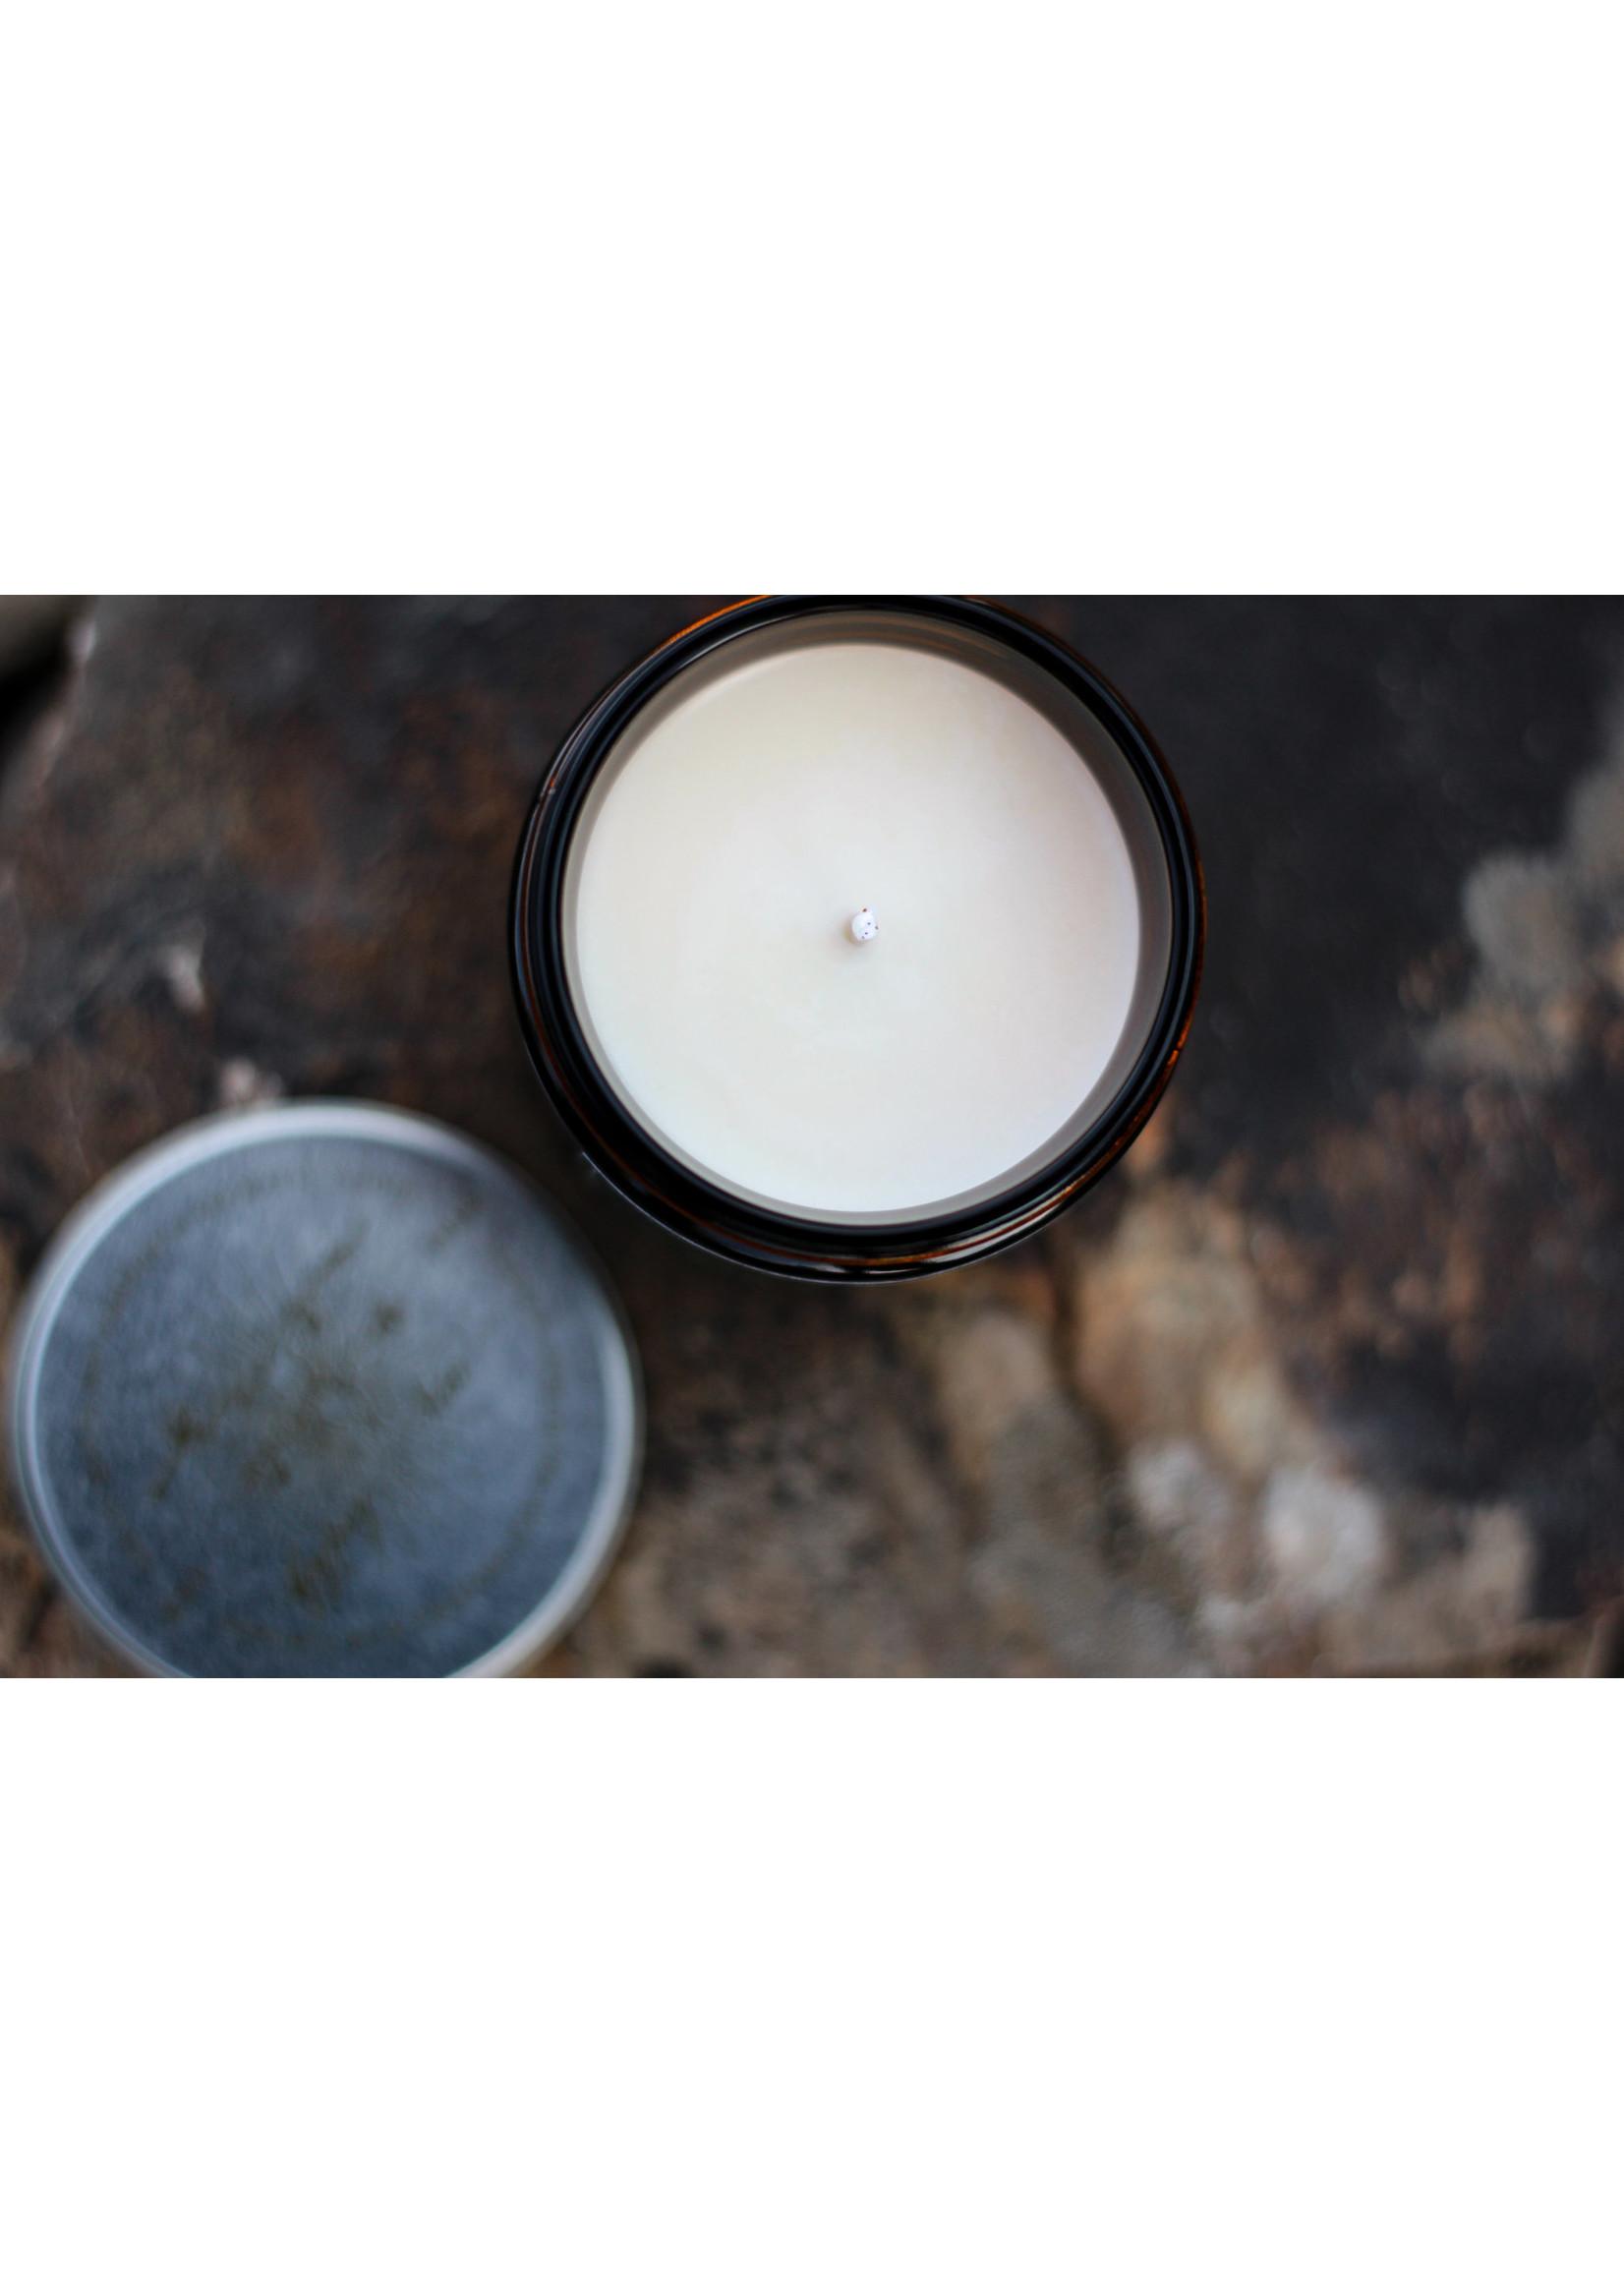 Gypsy Vine Candle - Locally Handmade - Barefoot